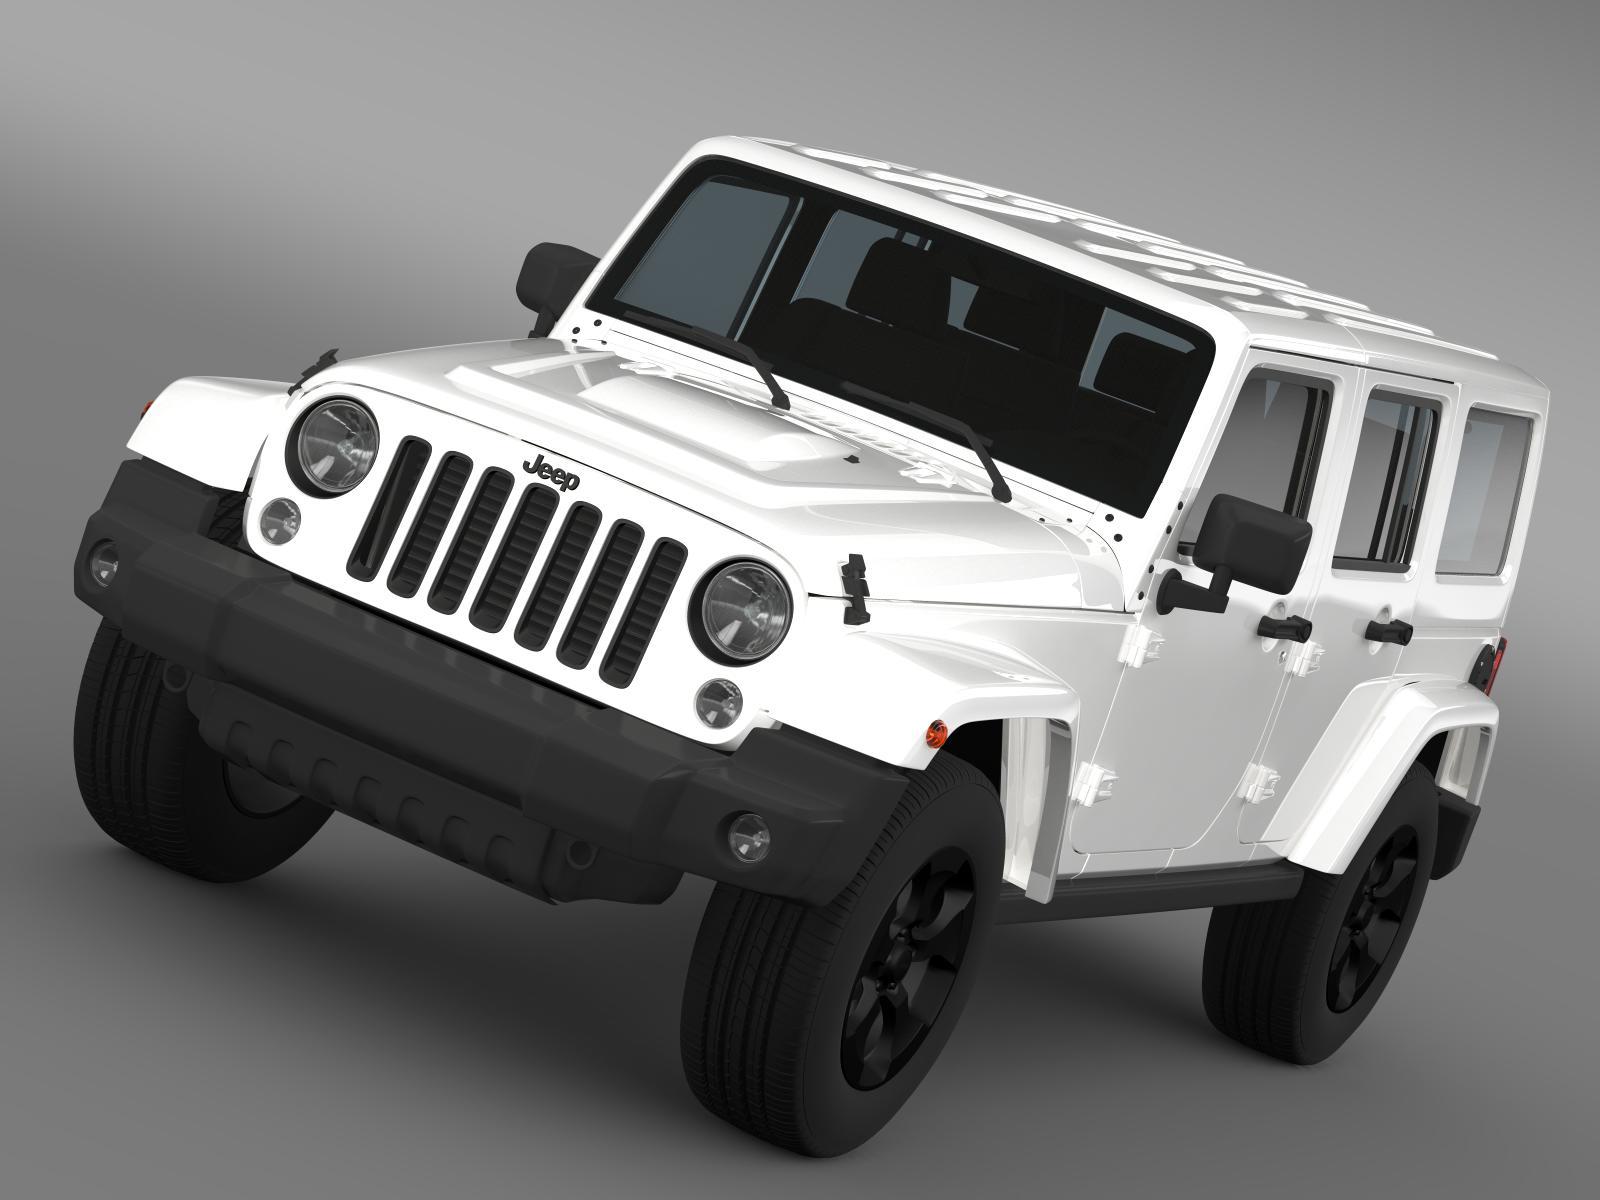 jeep wrangler 2015 black. jeep wrangler black edition 2 2015 12804kb jpg by creator_3d